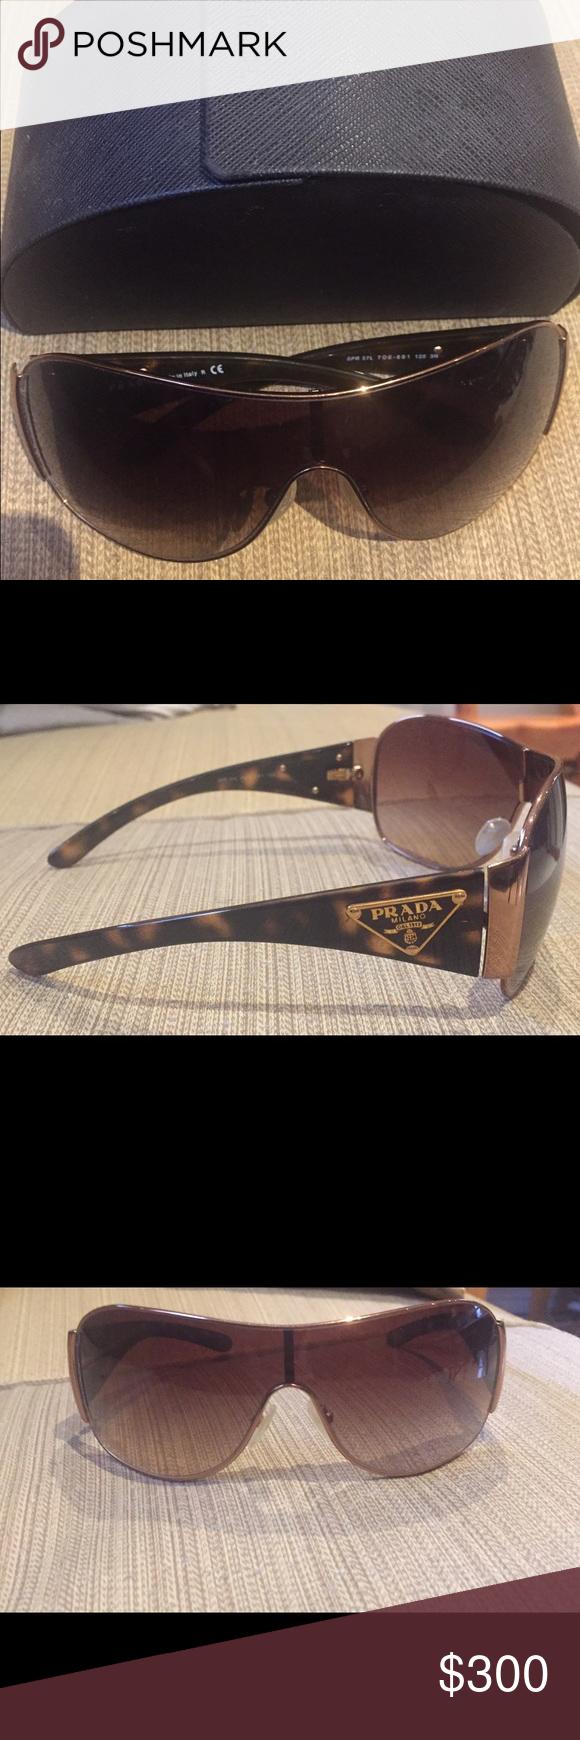 5f26437f49ec Prada sunglasses with case Prada sunglasses with bronze trim with case  looking for  300 Accessories Sunglasses